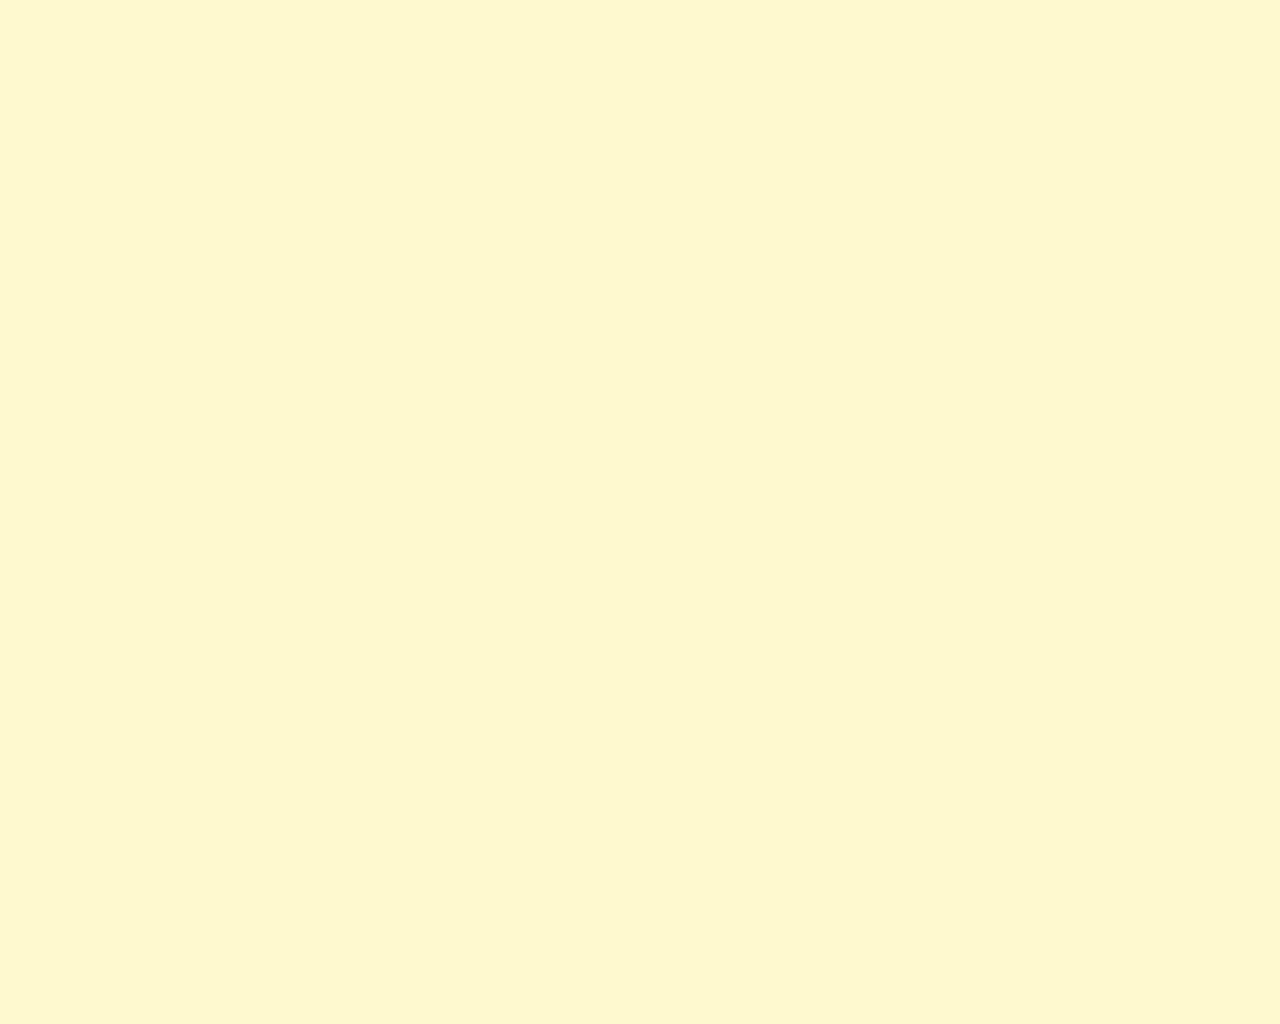 1280x1024 Lemon Chiffon Solid Color Background